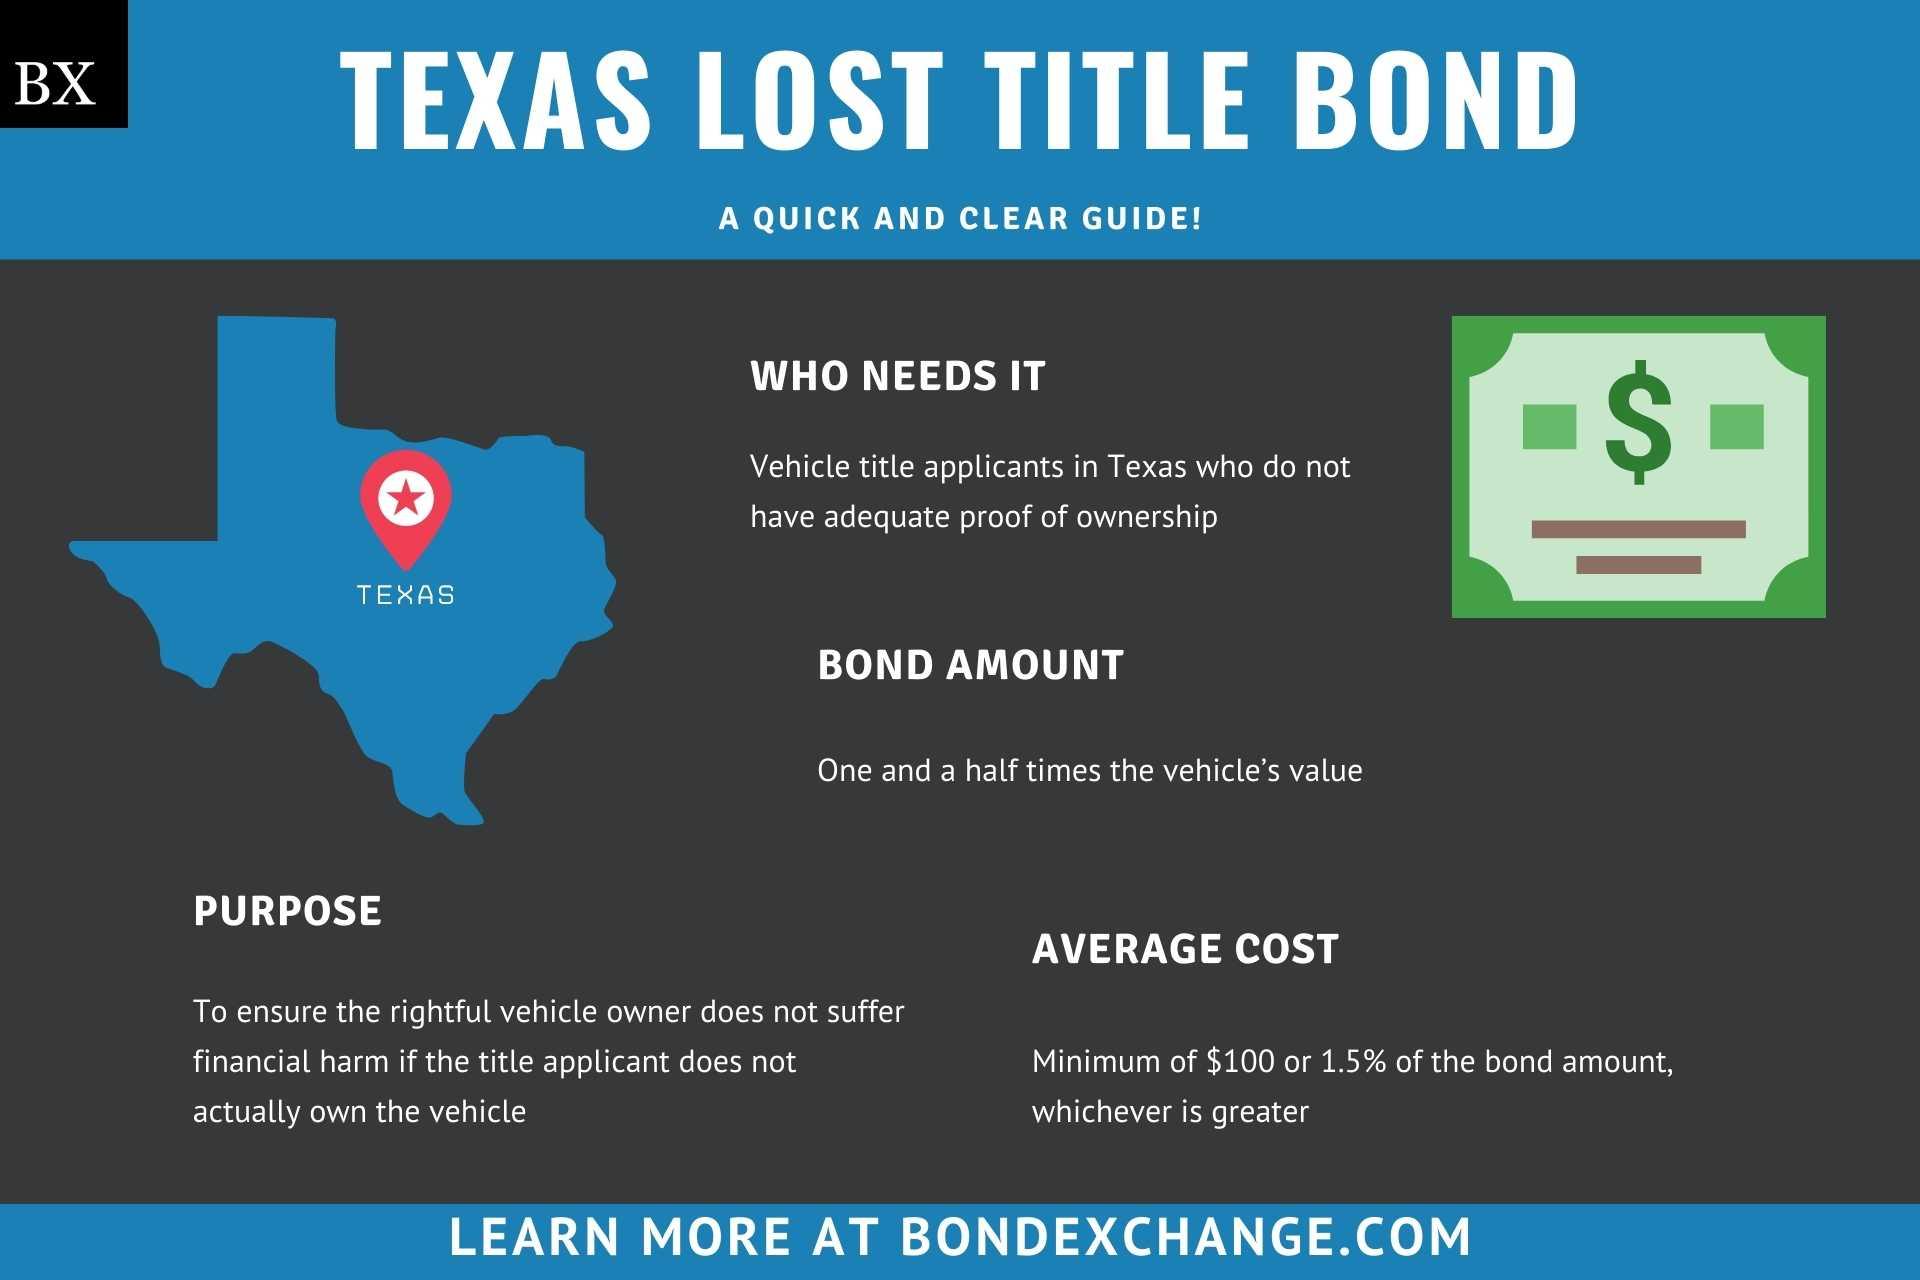 Texas Lost Title Bond